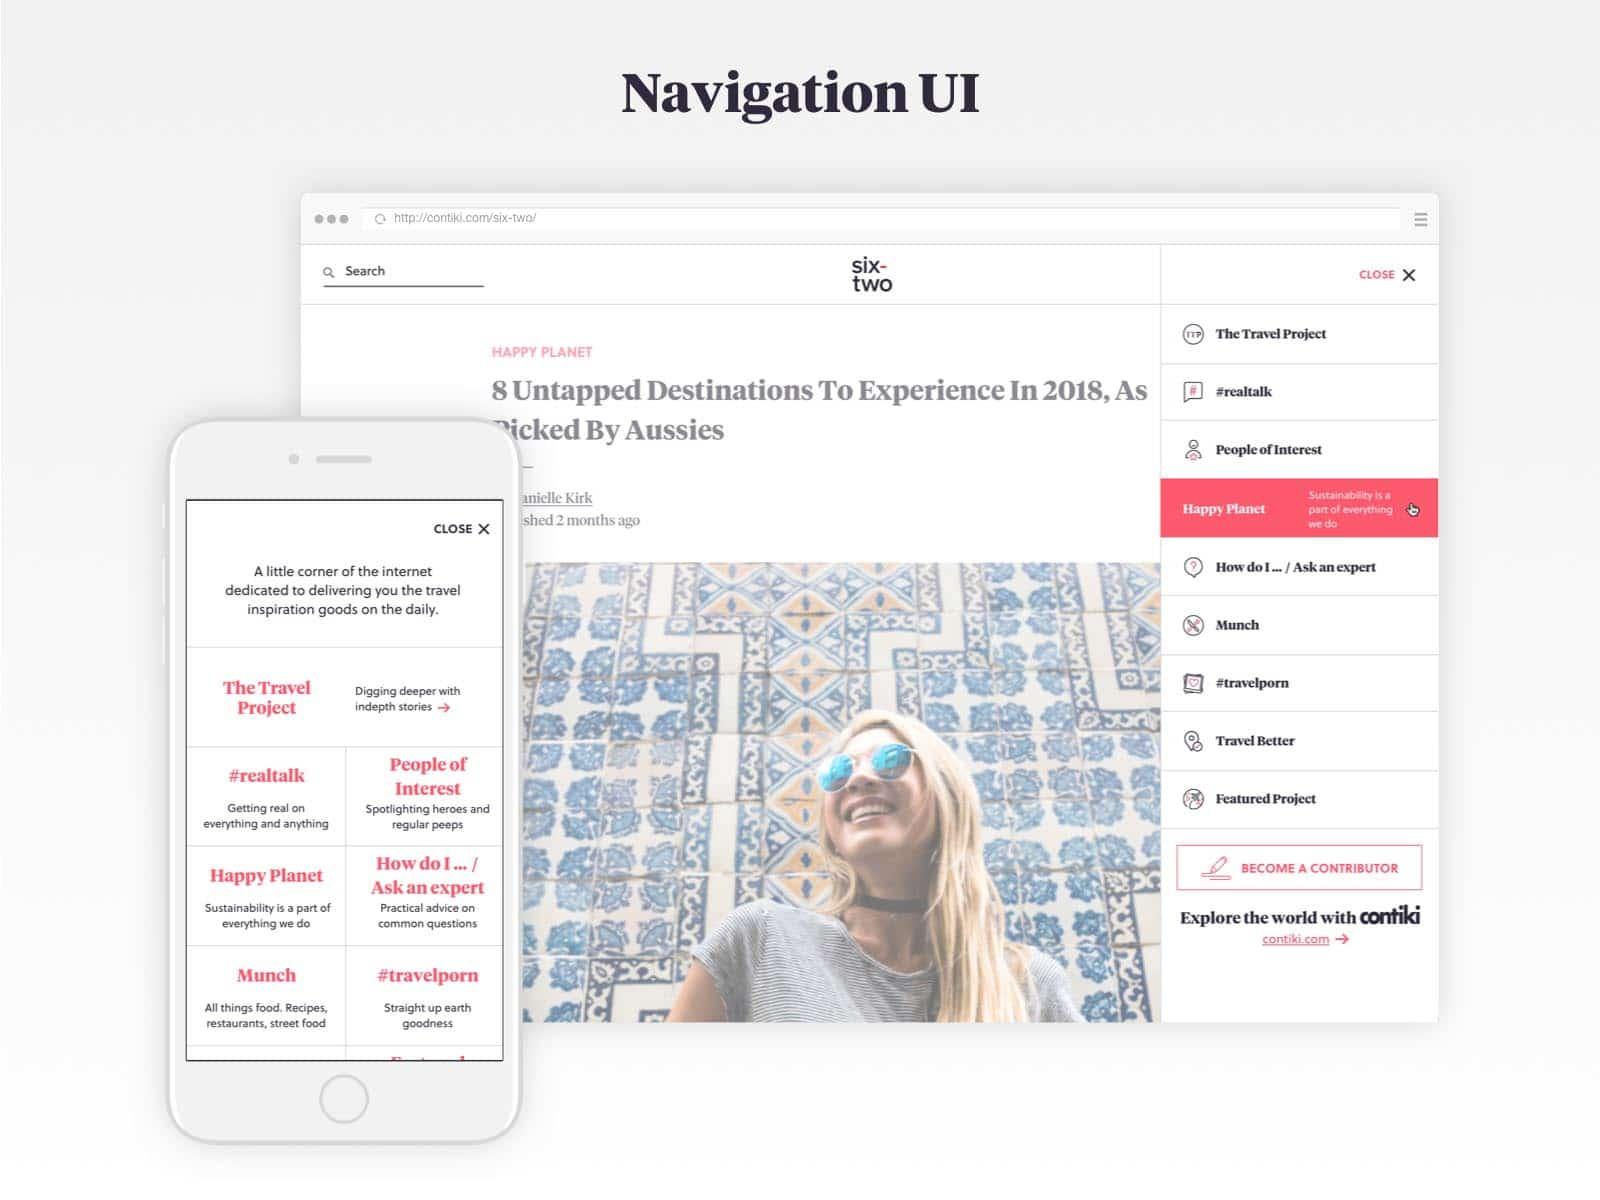 six-two navigation UI design